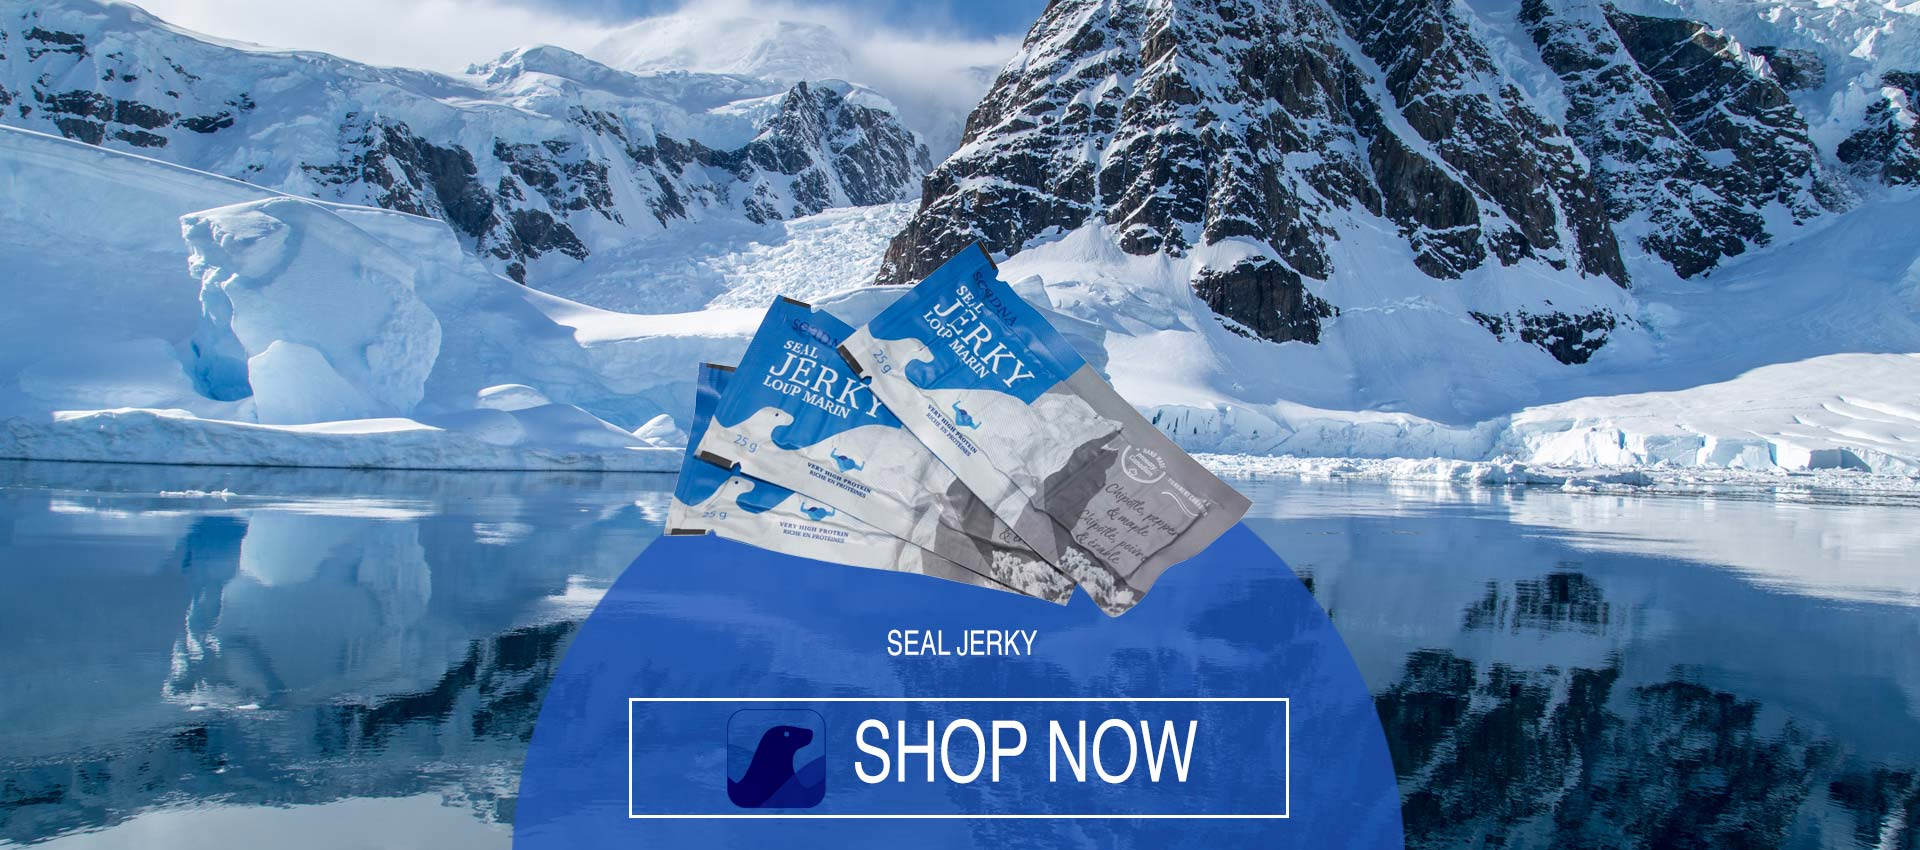 SeaDNA Seal Jerky